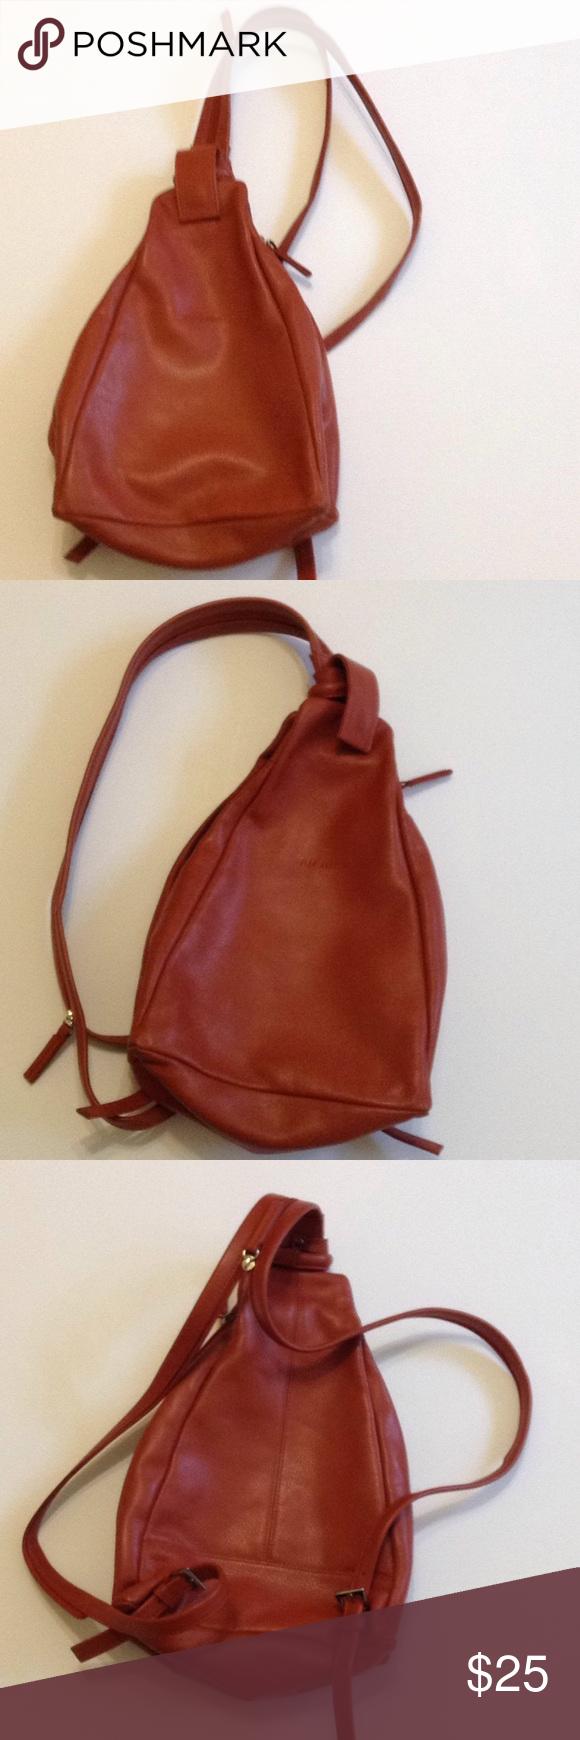 Wilson Leather Backpack purse Burnt Orange Leather